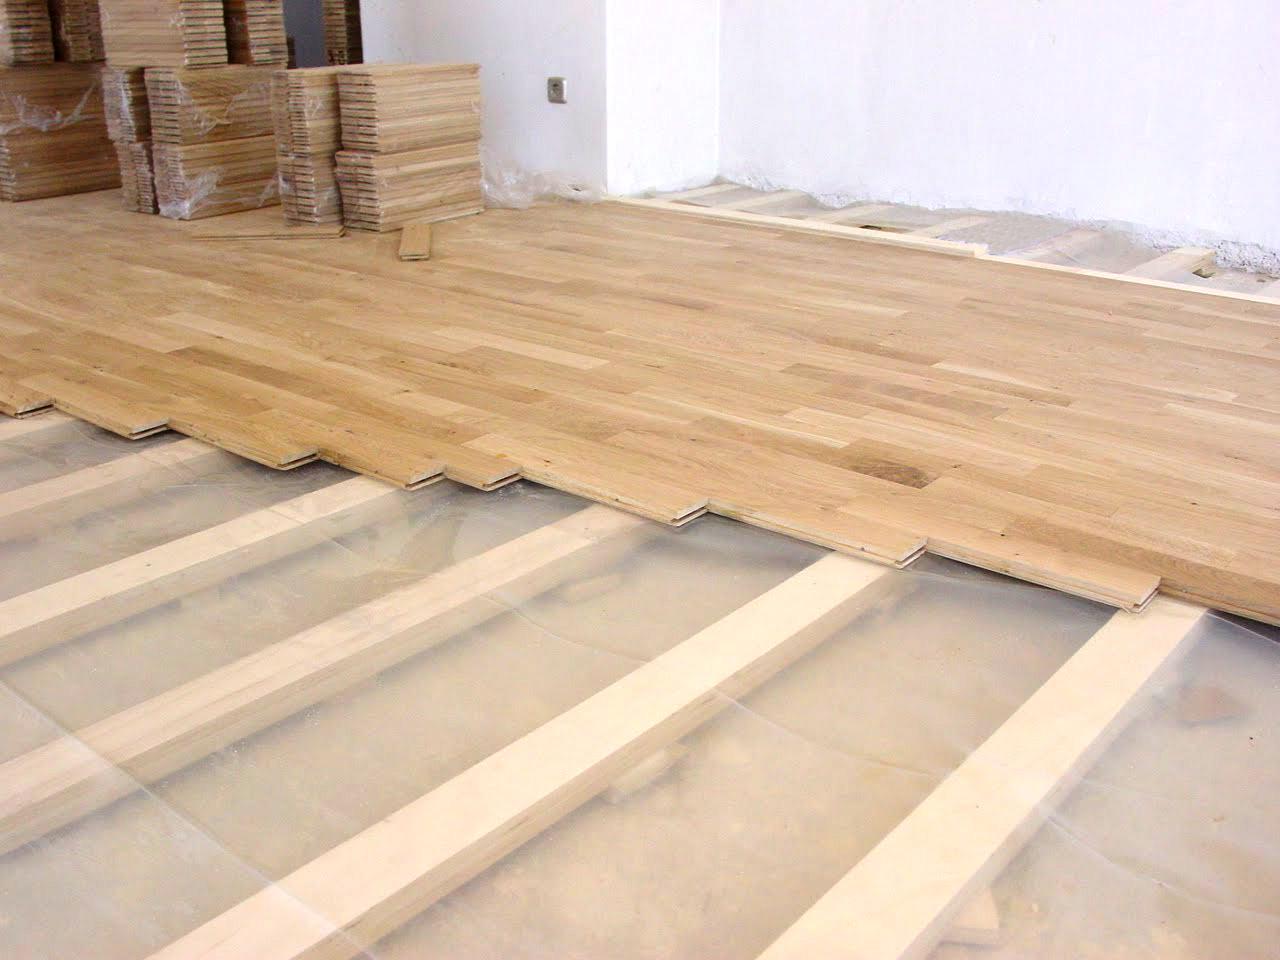 Dormitorio muebles modernos como colocar tarima de madera - Tarima flotante de madera ...